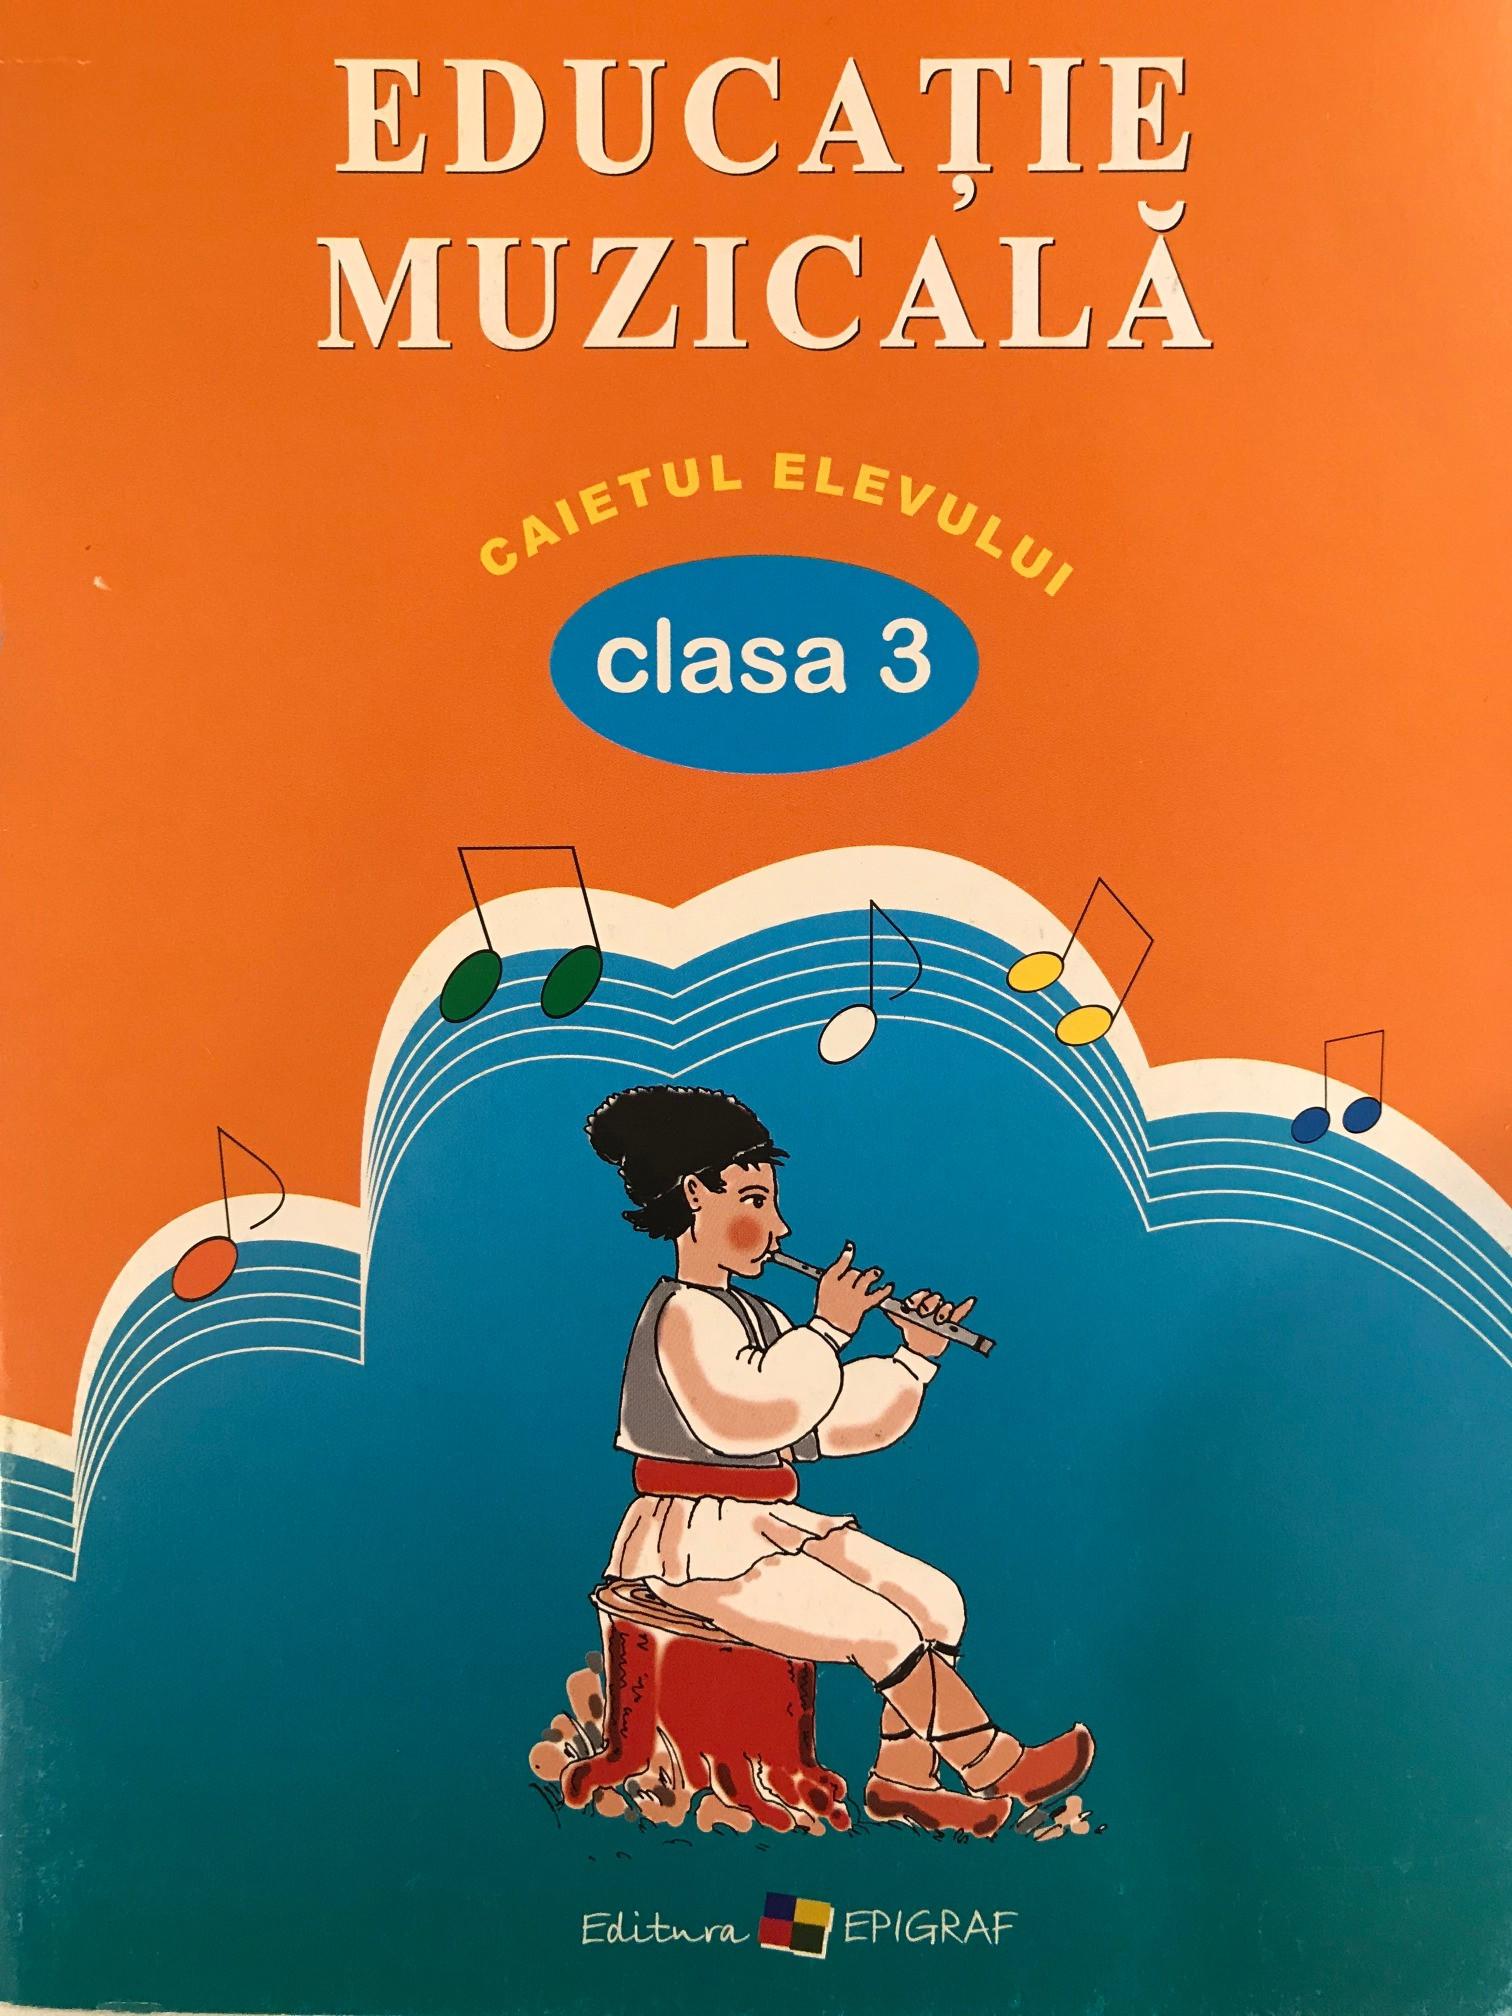 Caiet de educatie muzicala clasa III-a.